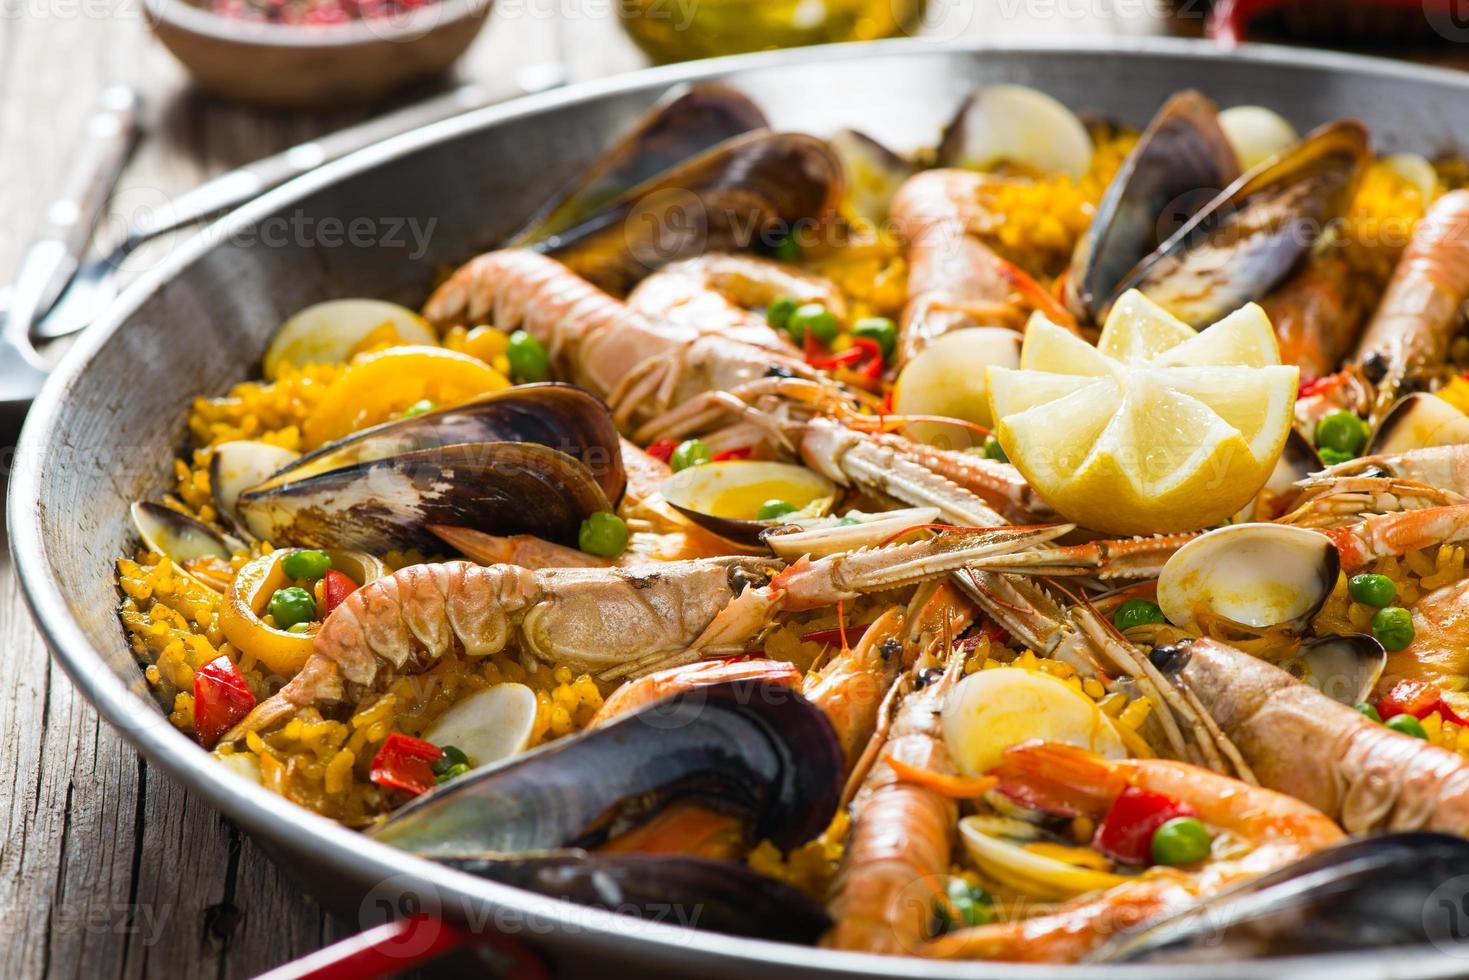 fruits de mer paella espagnole photo